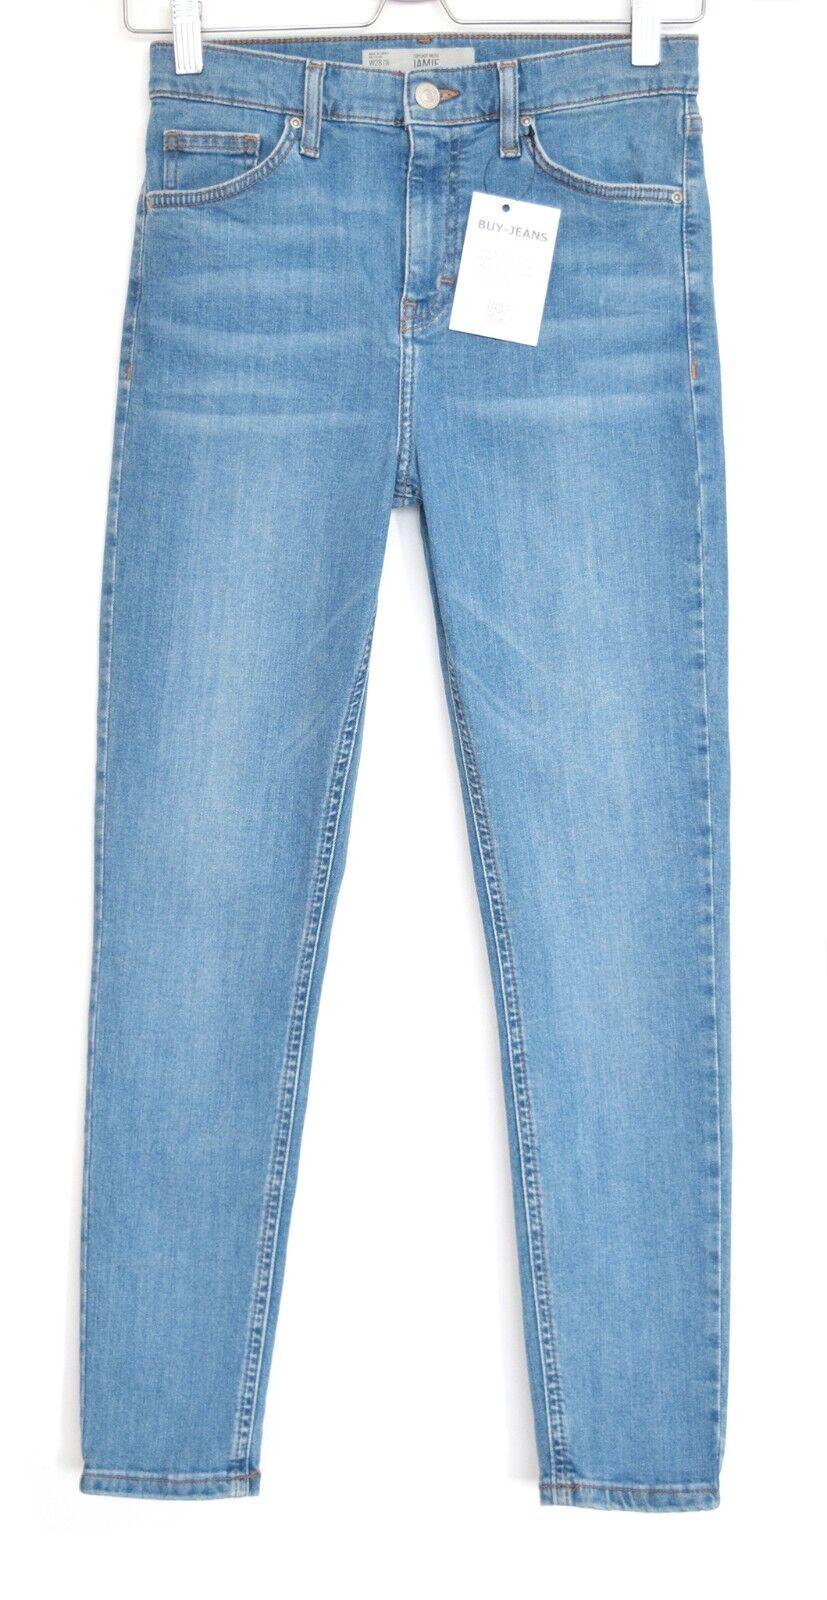 Topshop SUPER SKINNY JAMIE High Rise Medium bluee Stretch Jeans Size 6 8 W26 L32